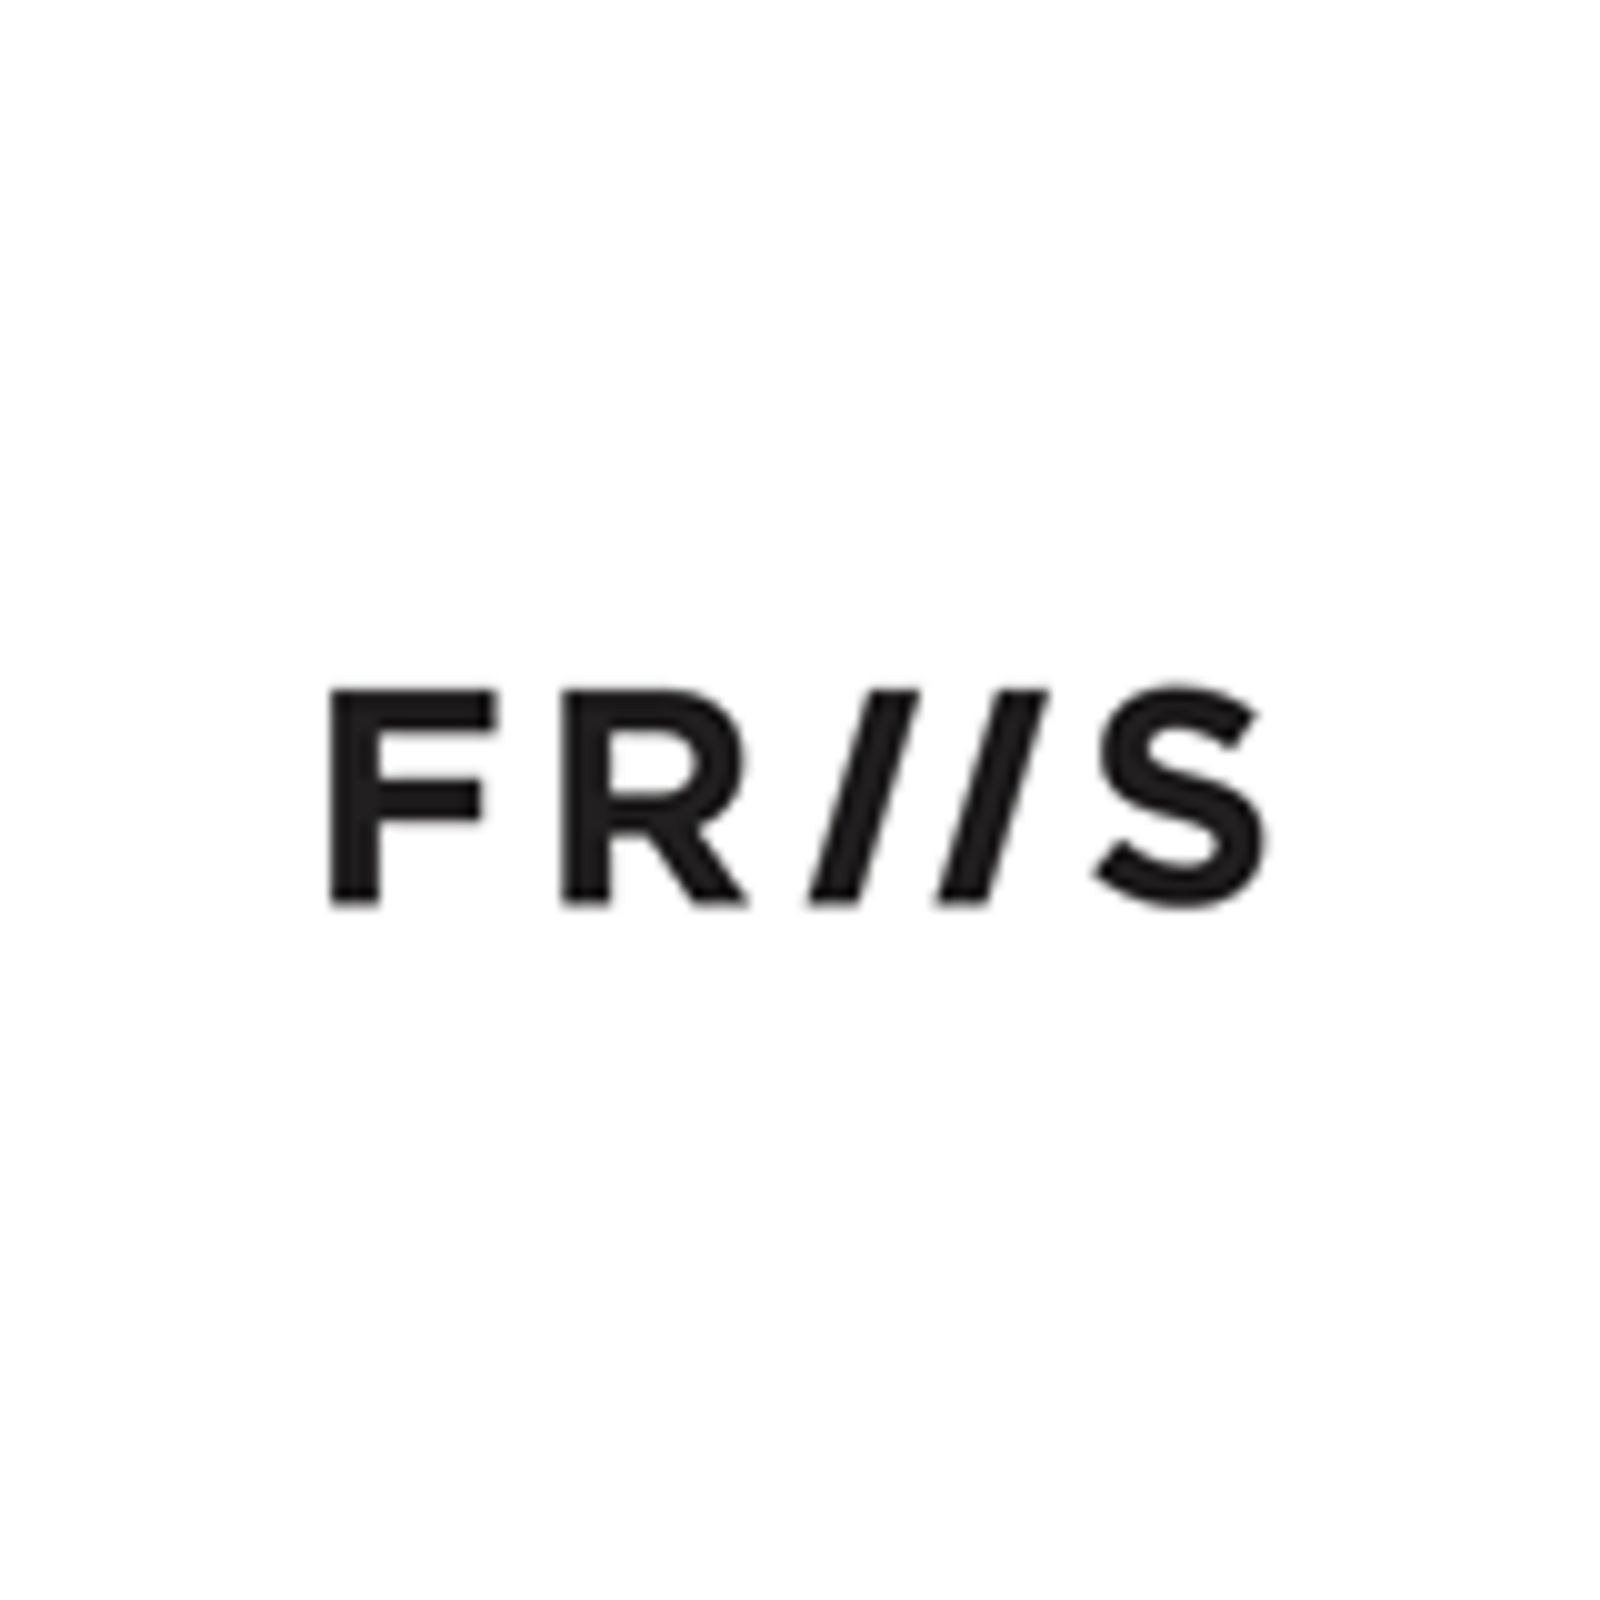 FRIIS Co.